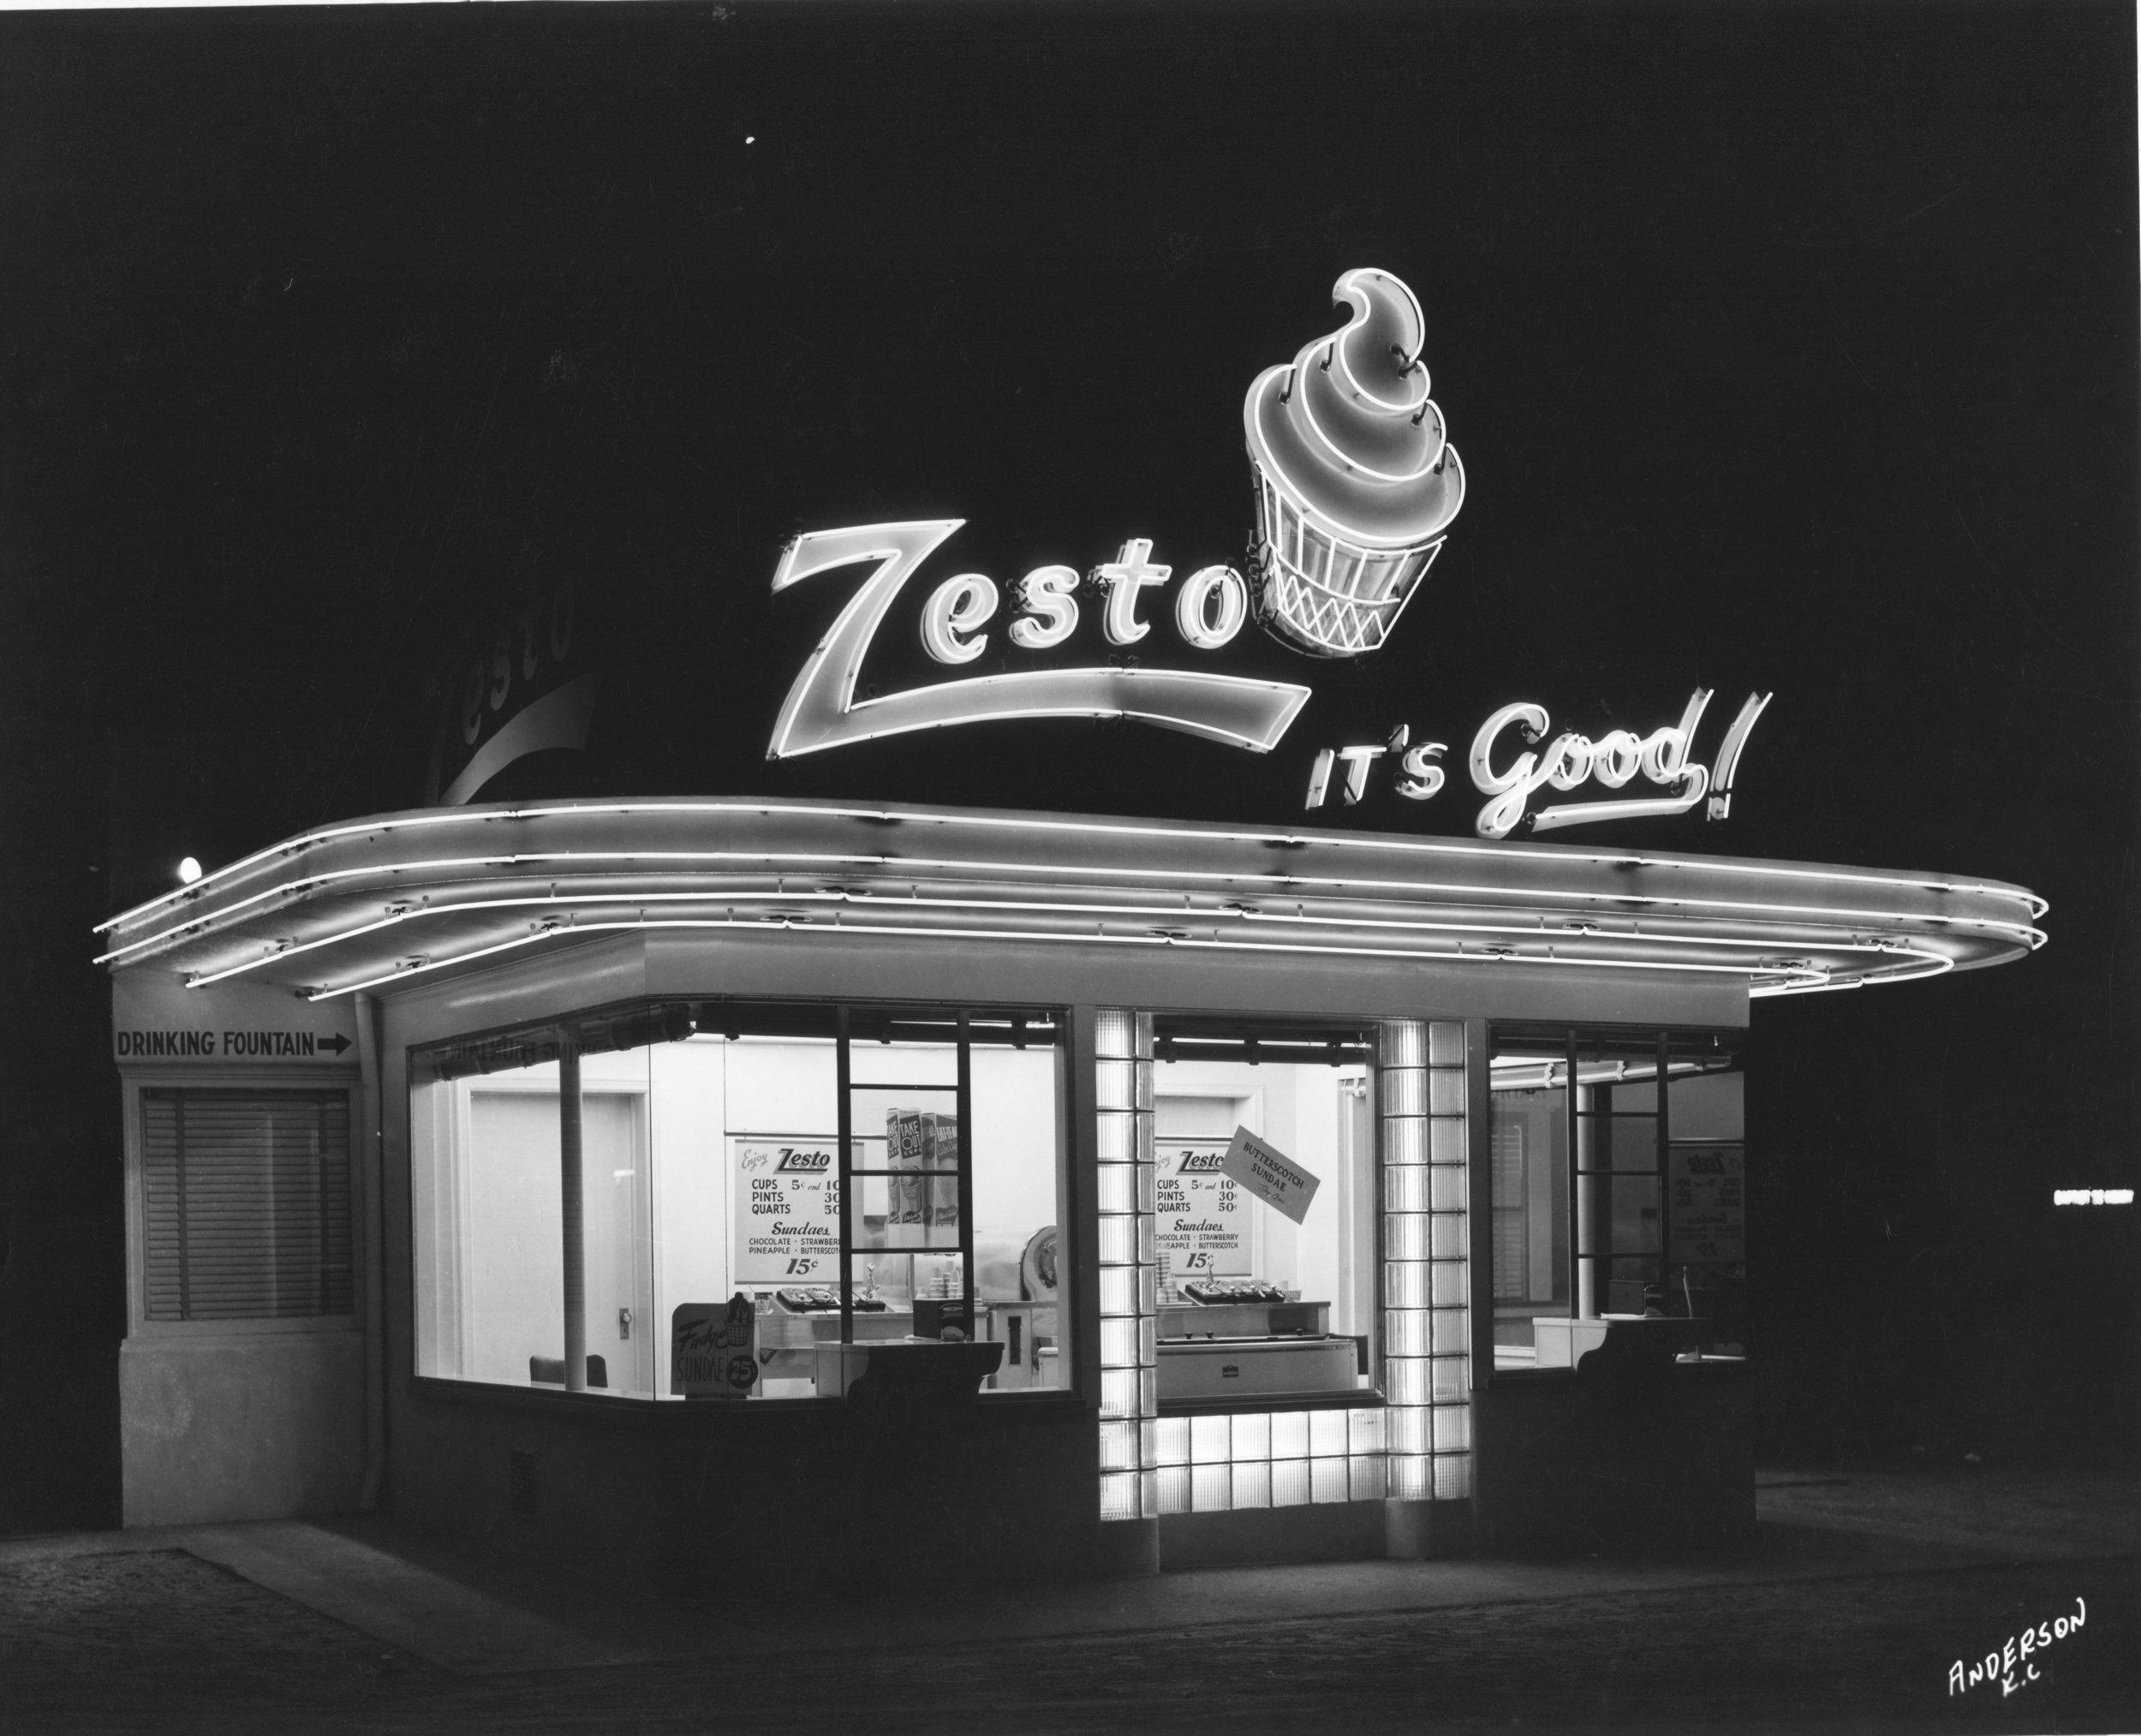 Wilborn Collection Zesto Drive-In night scene unknown location Anderson KC.jpg